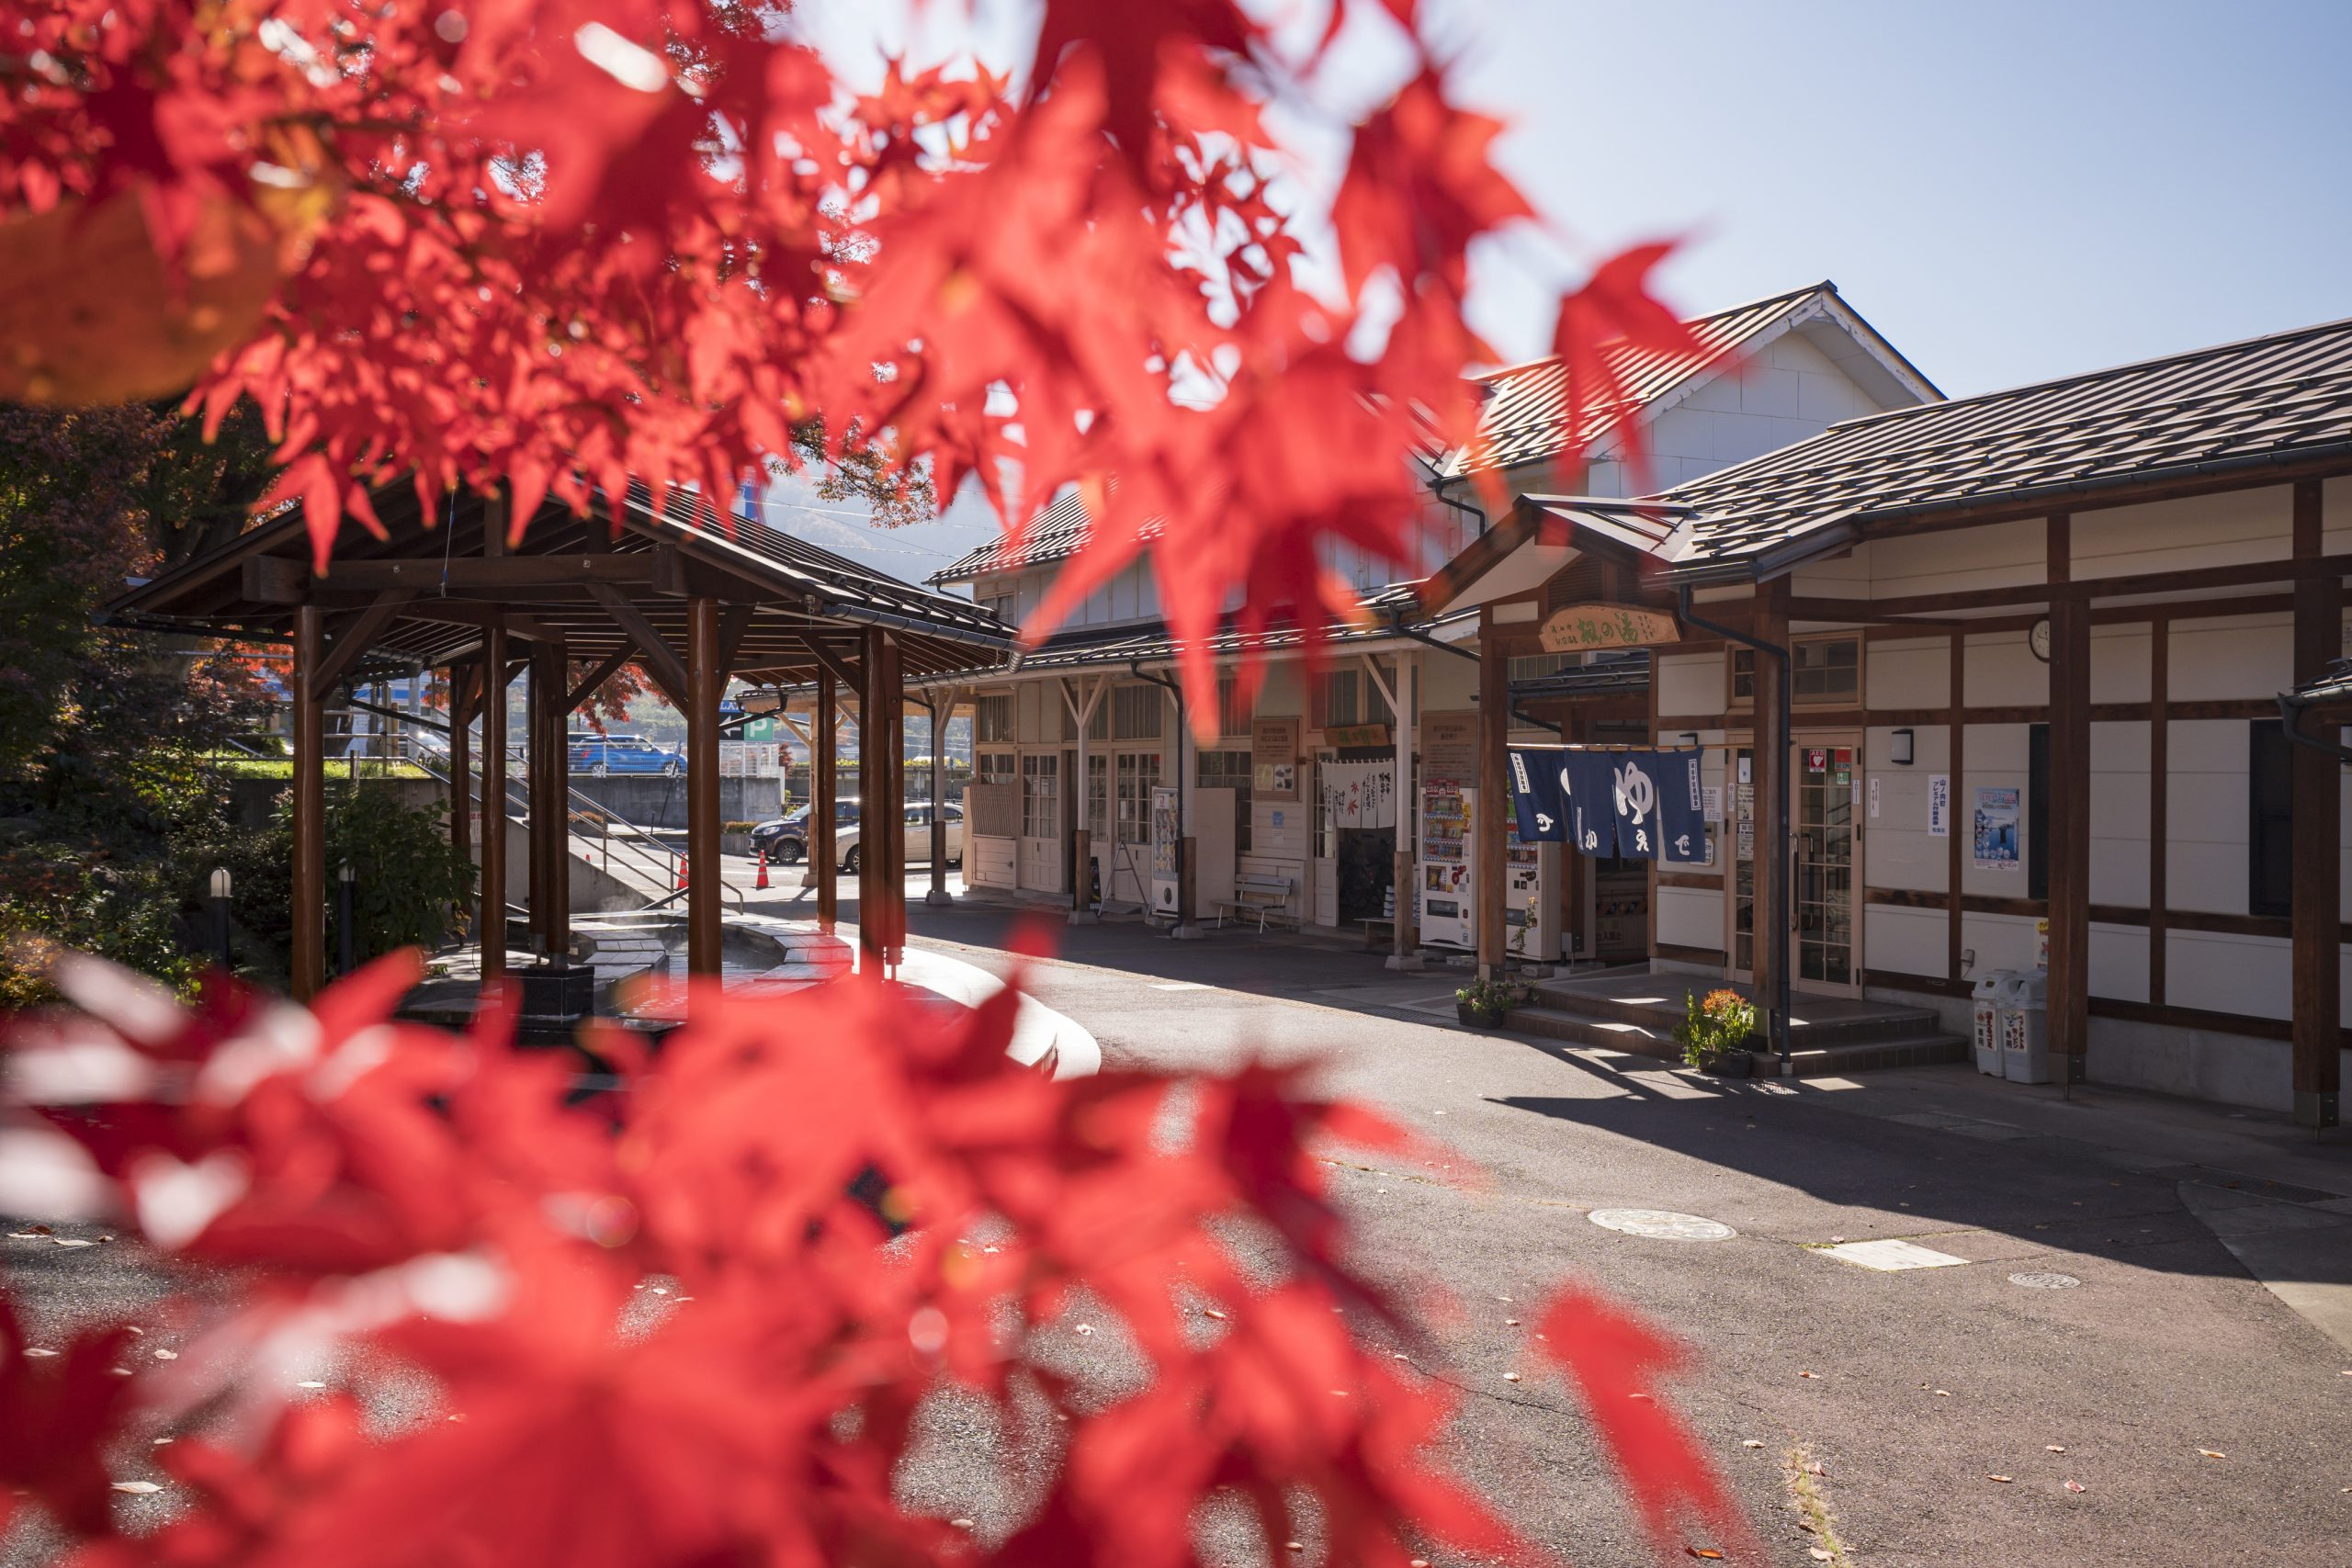 kaede-no-yu-yudanaka-onsen-autumn-leaves